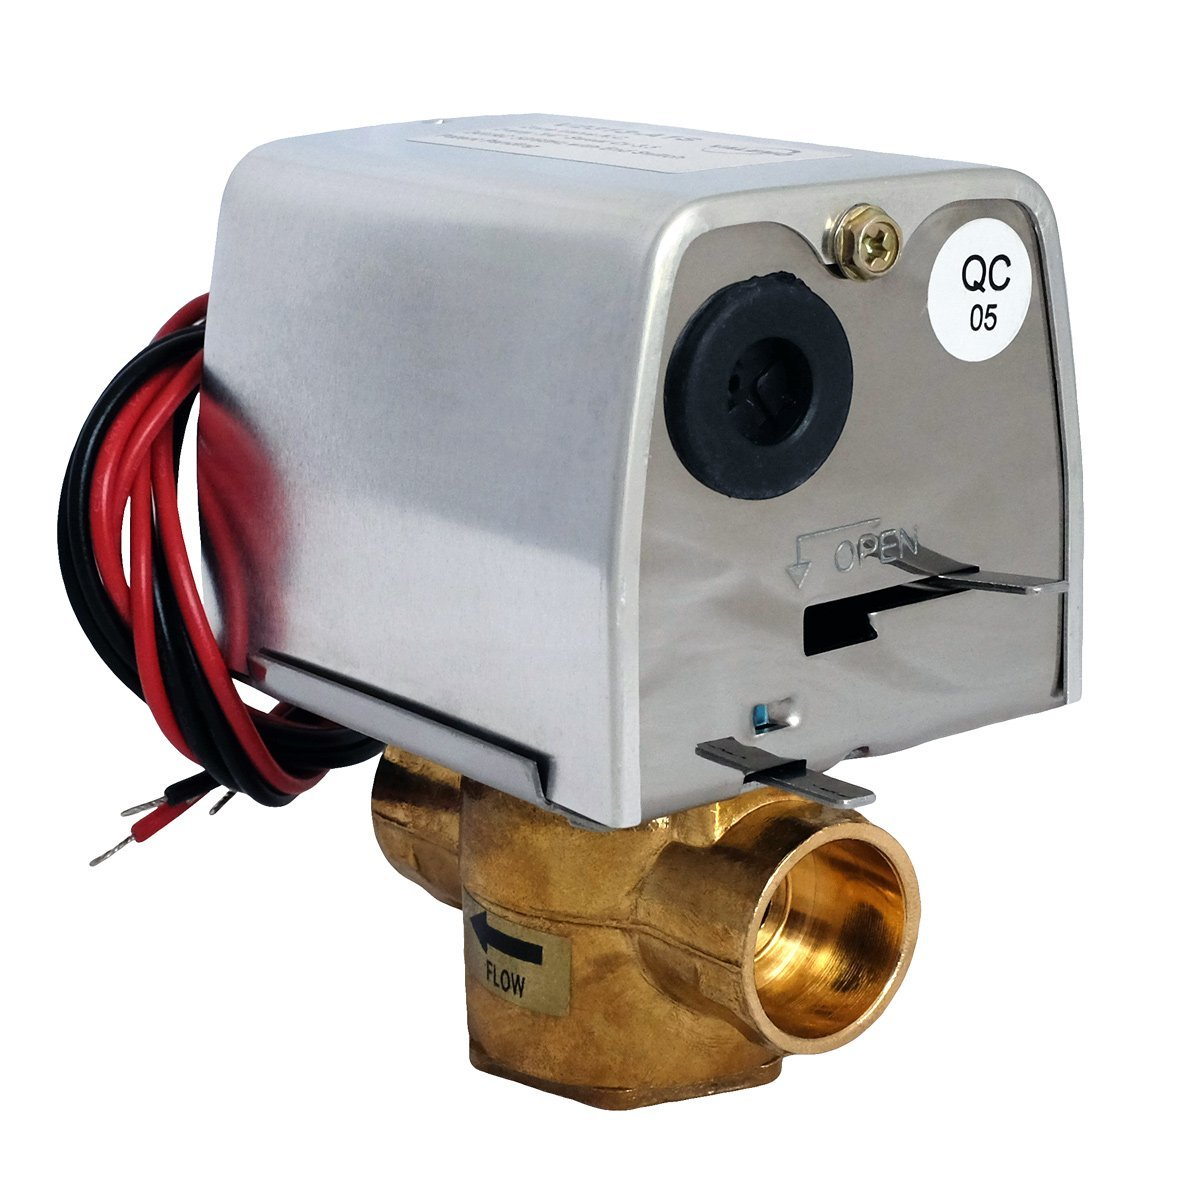 Valemo V2313-A1S Motorized Zone Valve, 2-way 3/4'', Sweat, 24 VAC with End Switch by Valemo Controls (Image #2)